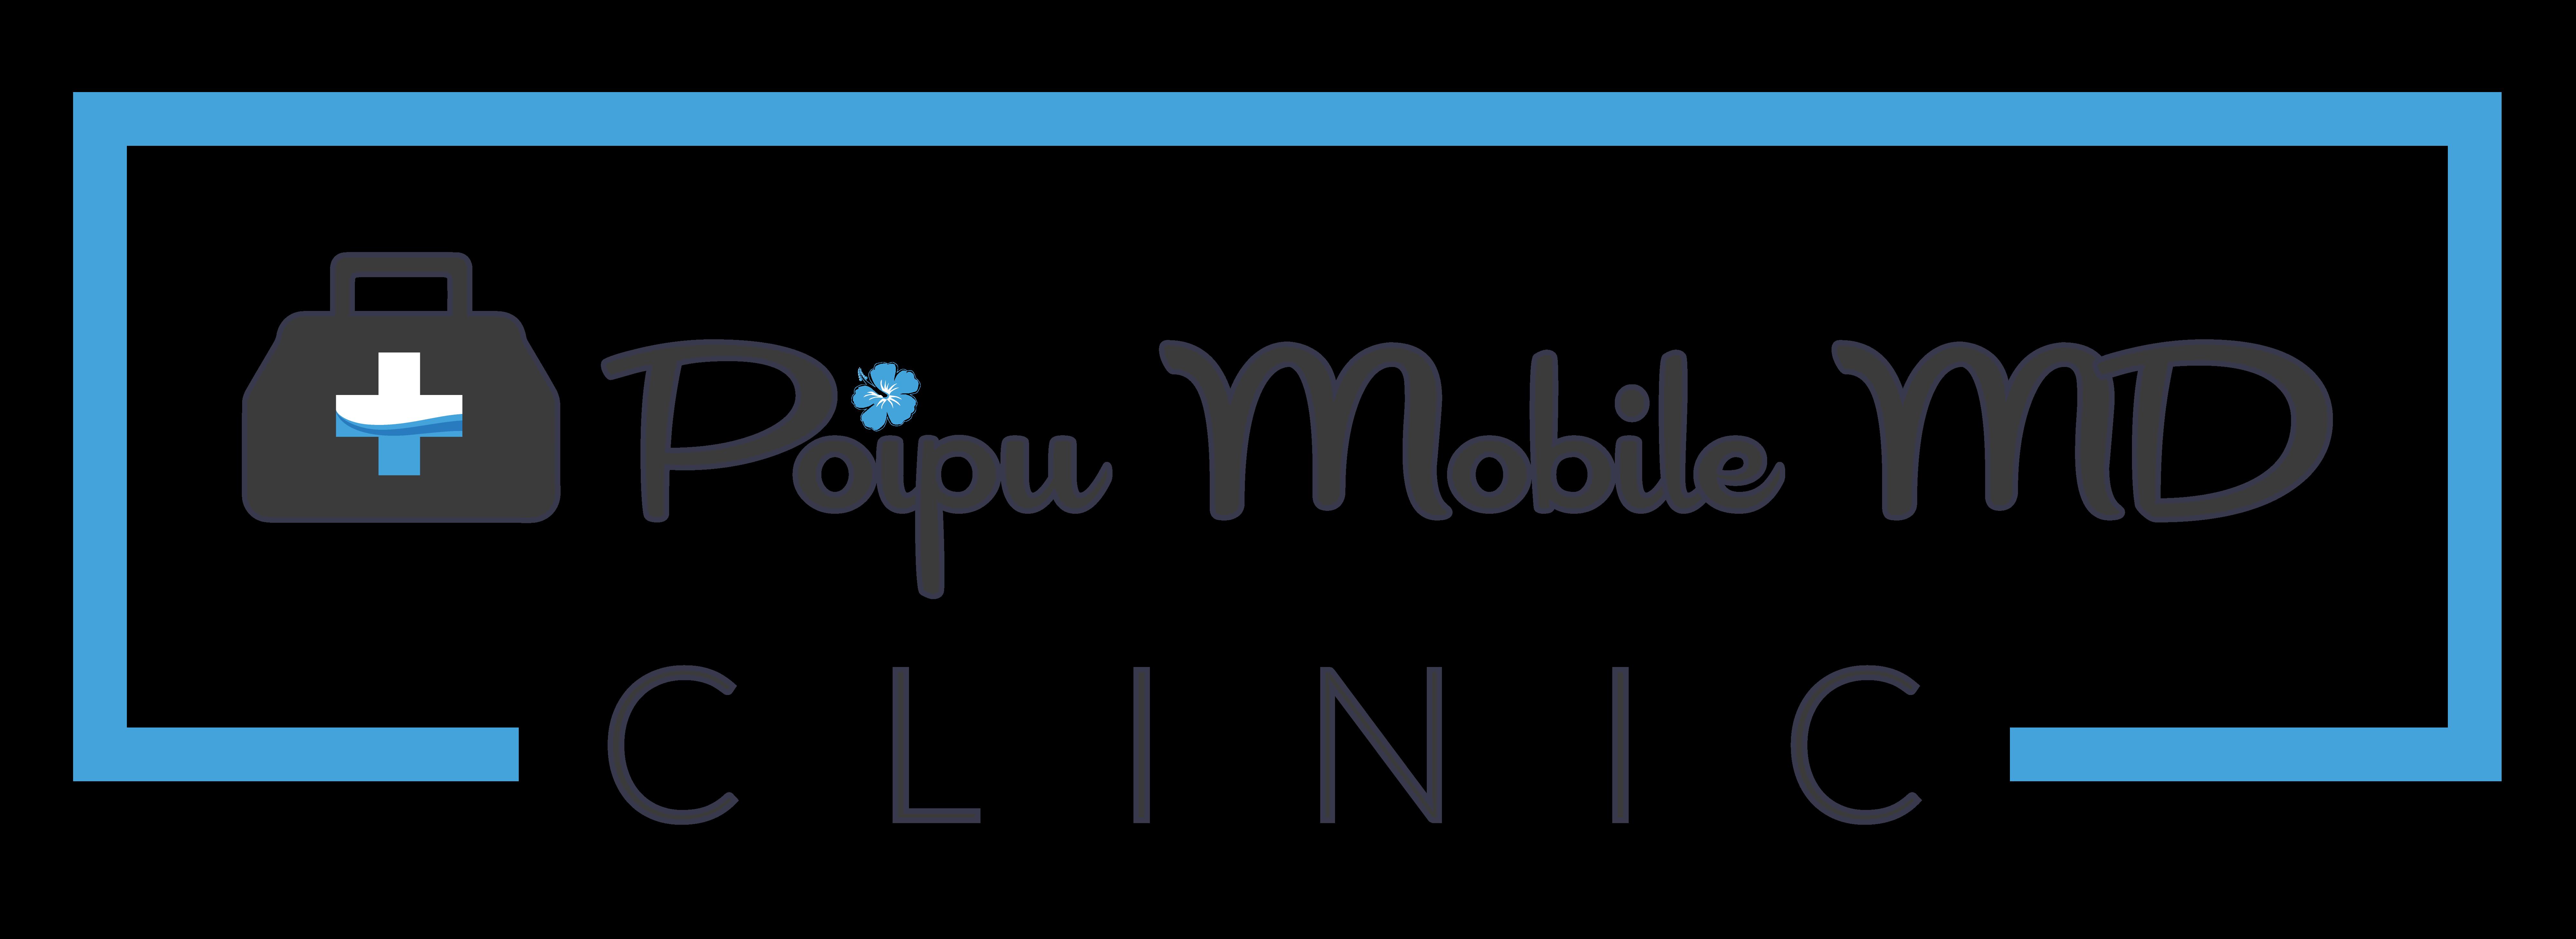 Poipu Mobile MD Clinic